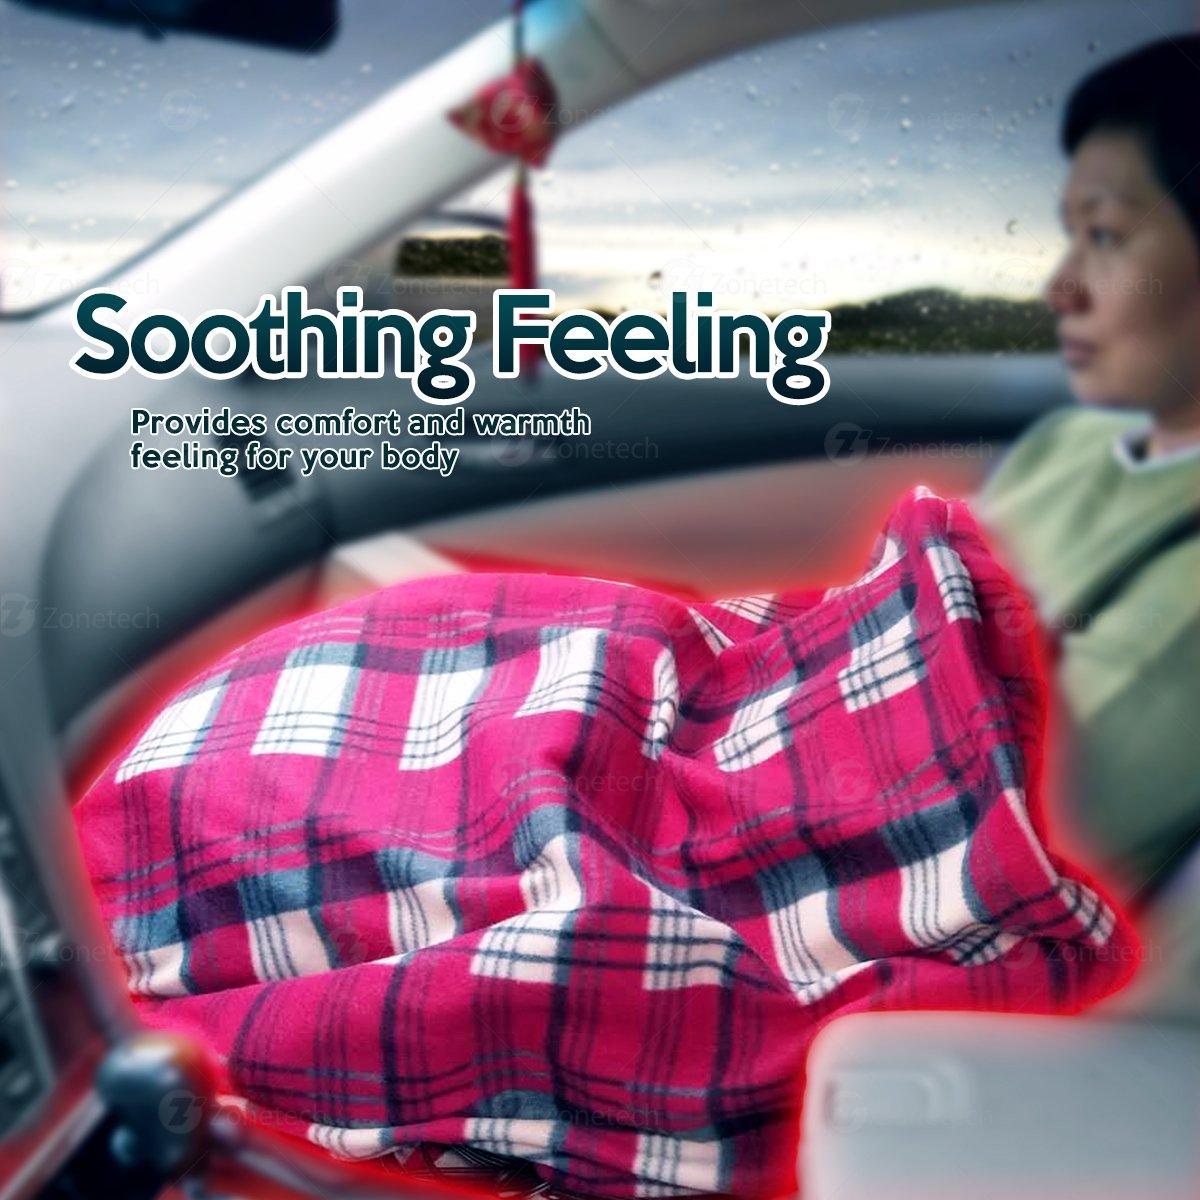 c39e2b1692 ... Travel Blanket – Plaid Premium Quality 12V Automotive Comfortable Heating  Car Seat Blanket Great for Summer. prev X next. prev X next. prev X next